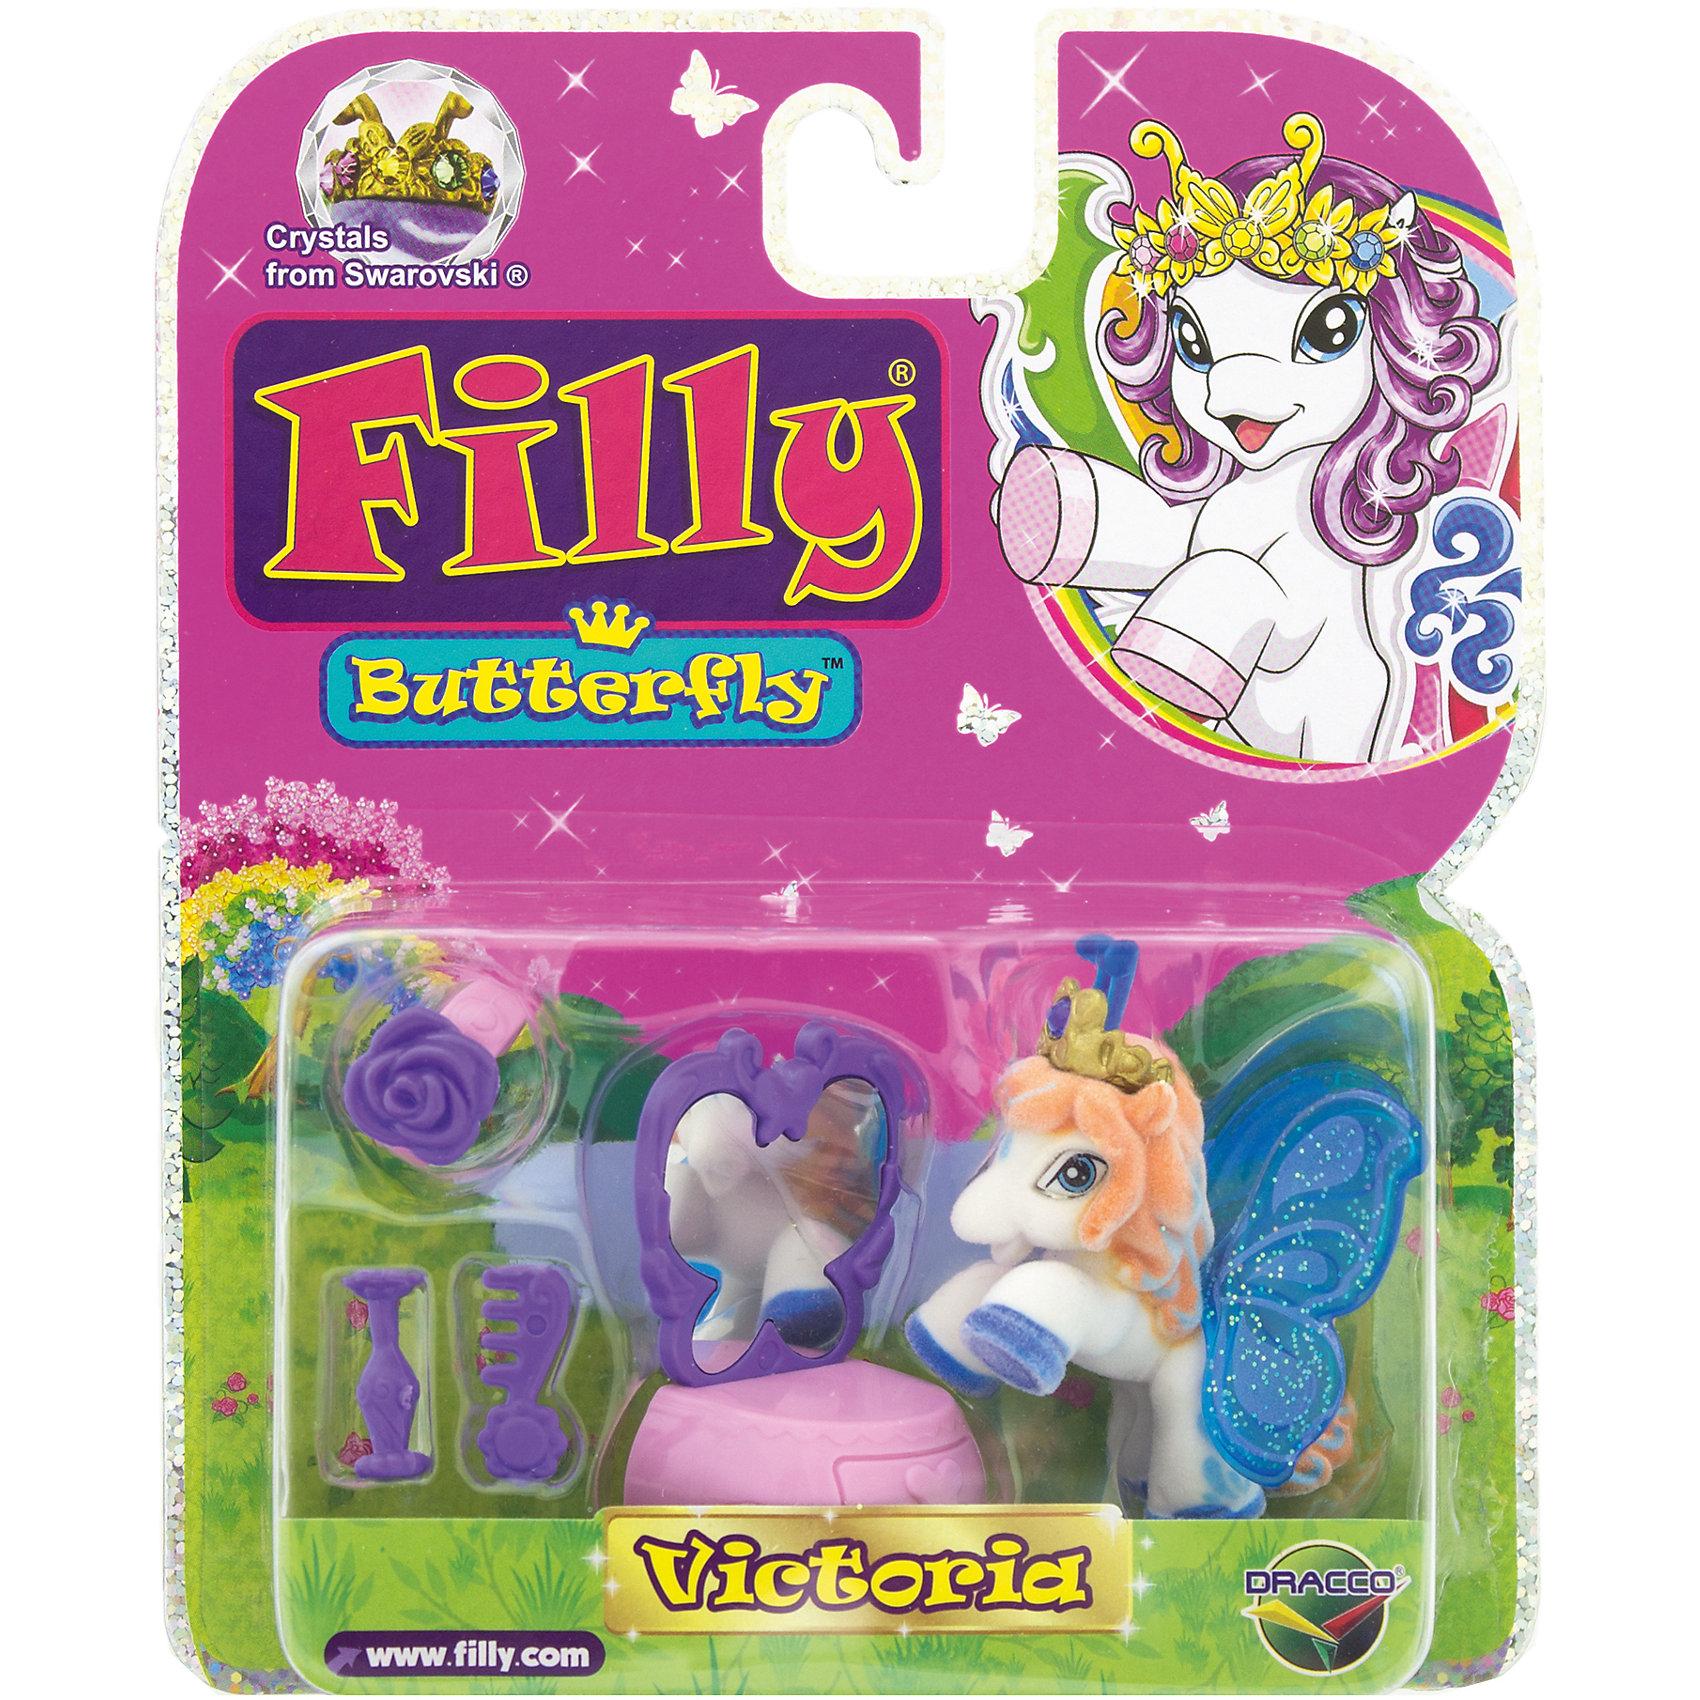 ������� � ������������ Victoria, Filly, Dracco (-)